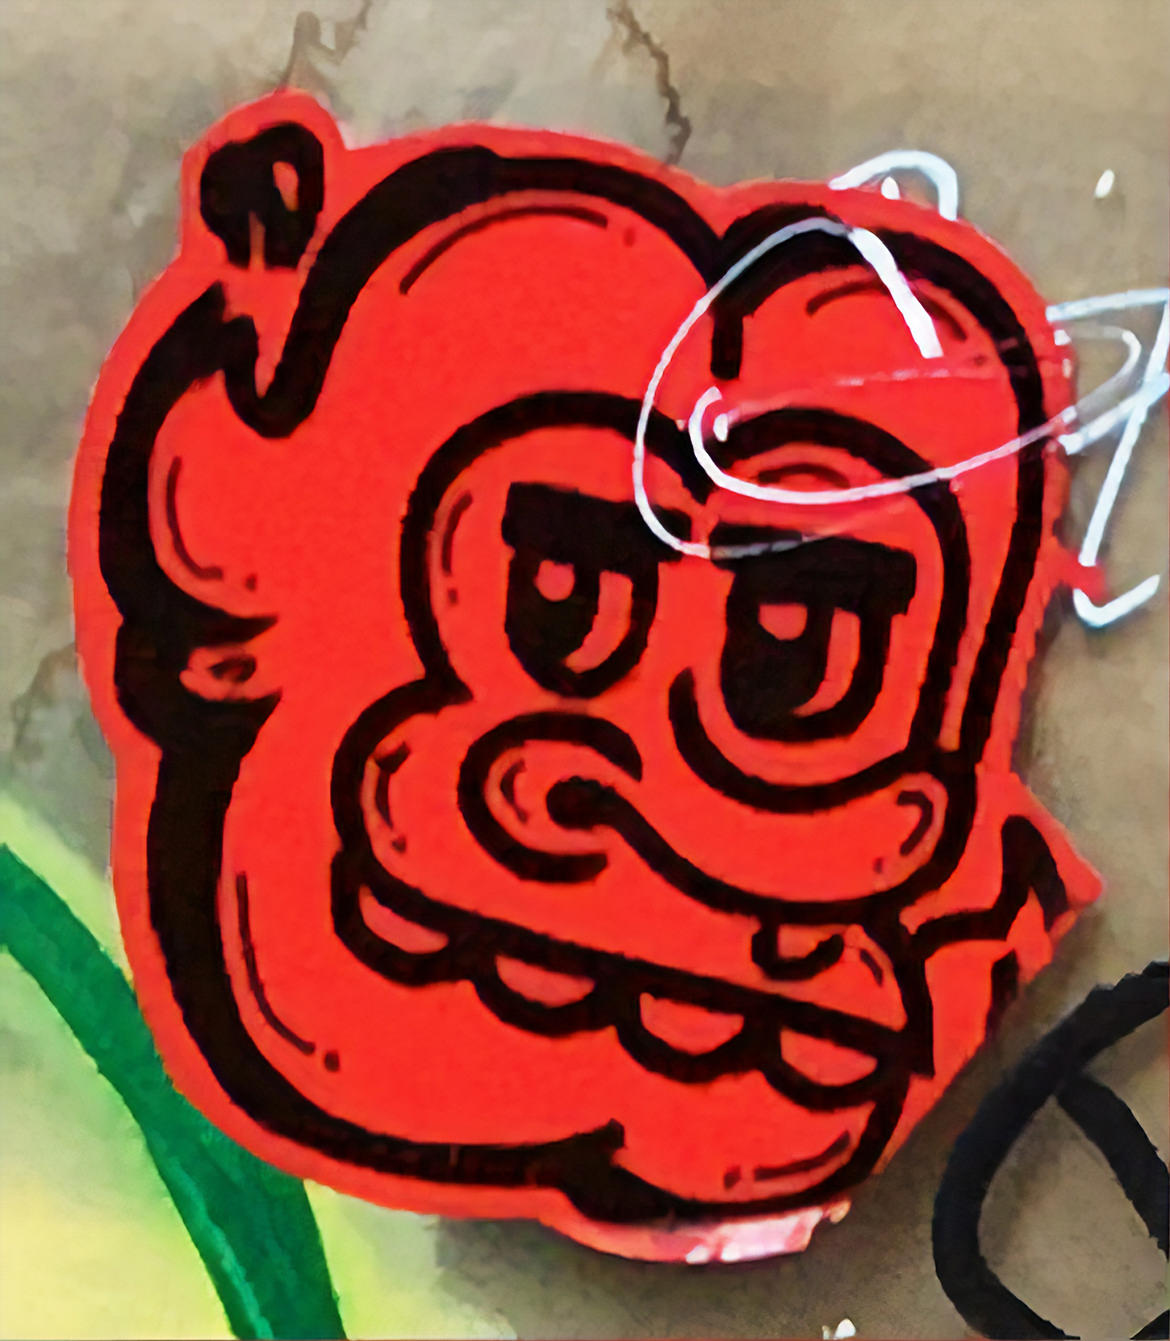 A graffiti sticker of a cartoon face in red and black